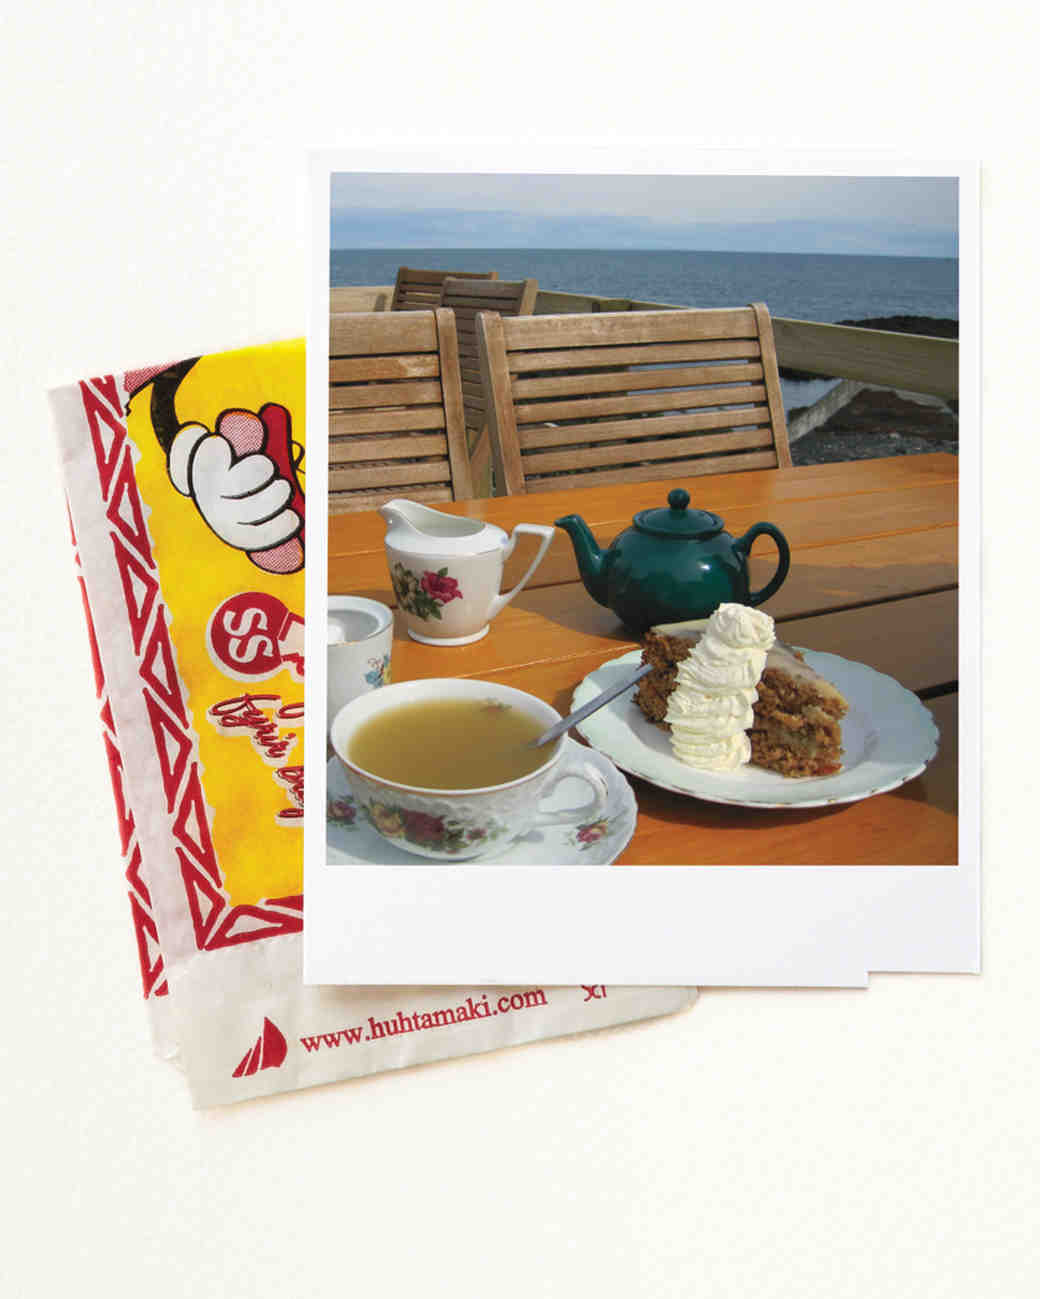 honeymoon-iceland-3-mwd107758.jpg